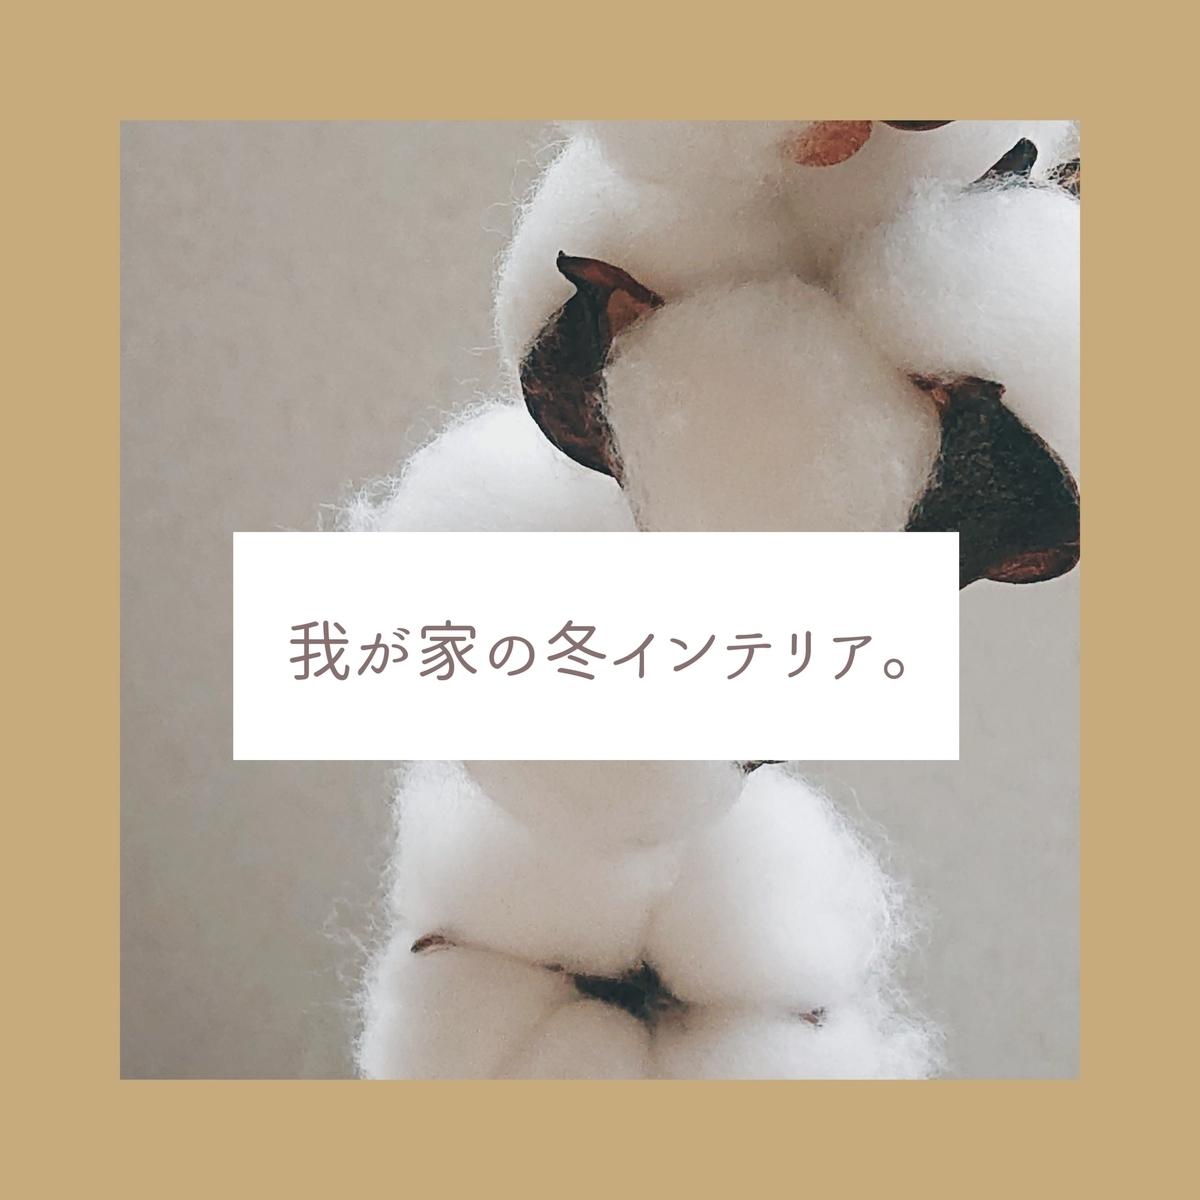 f:id:ooyuyuoo:20210211143806j:plain